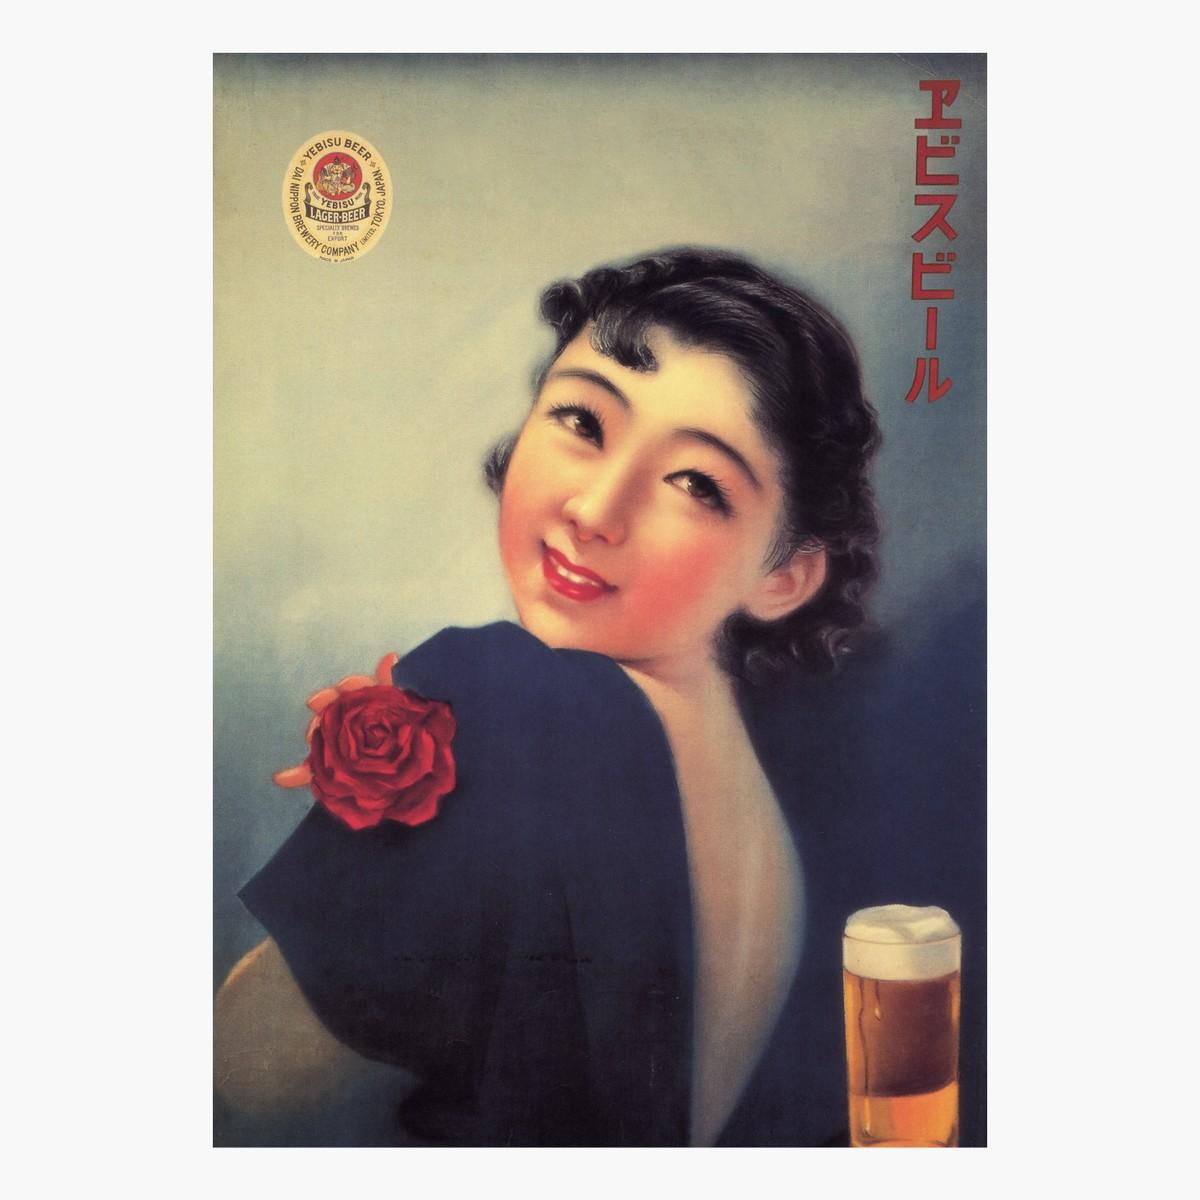 Photo of Yebisu Beer Vintage Advertising Poster